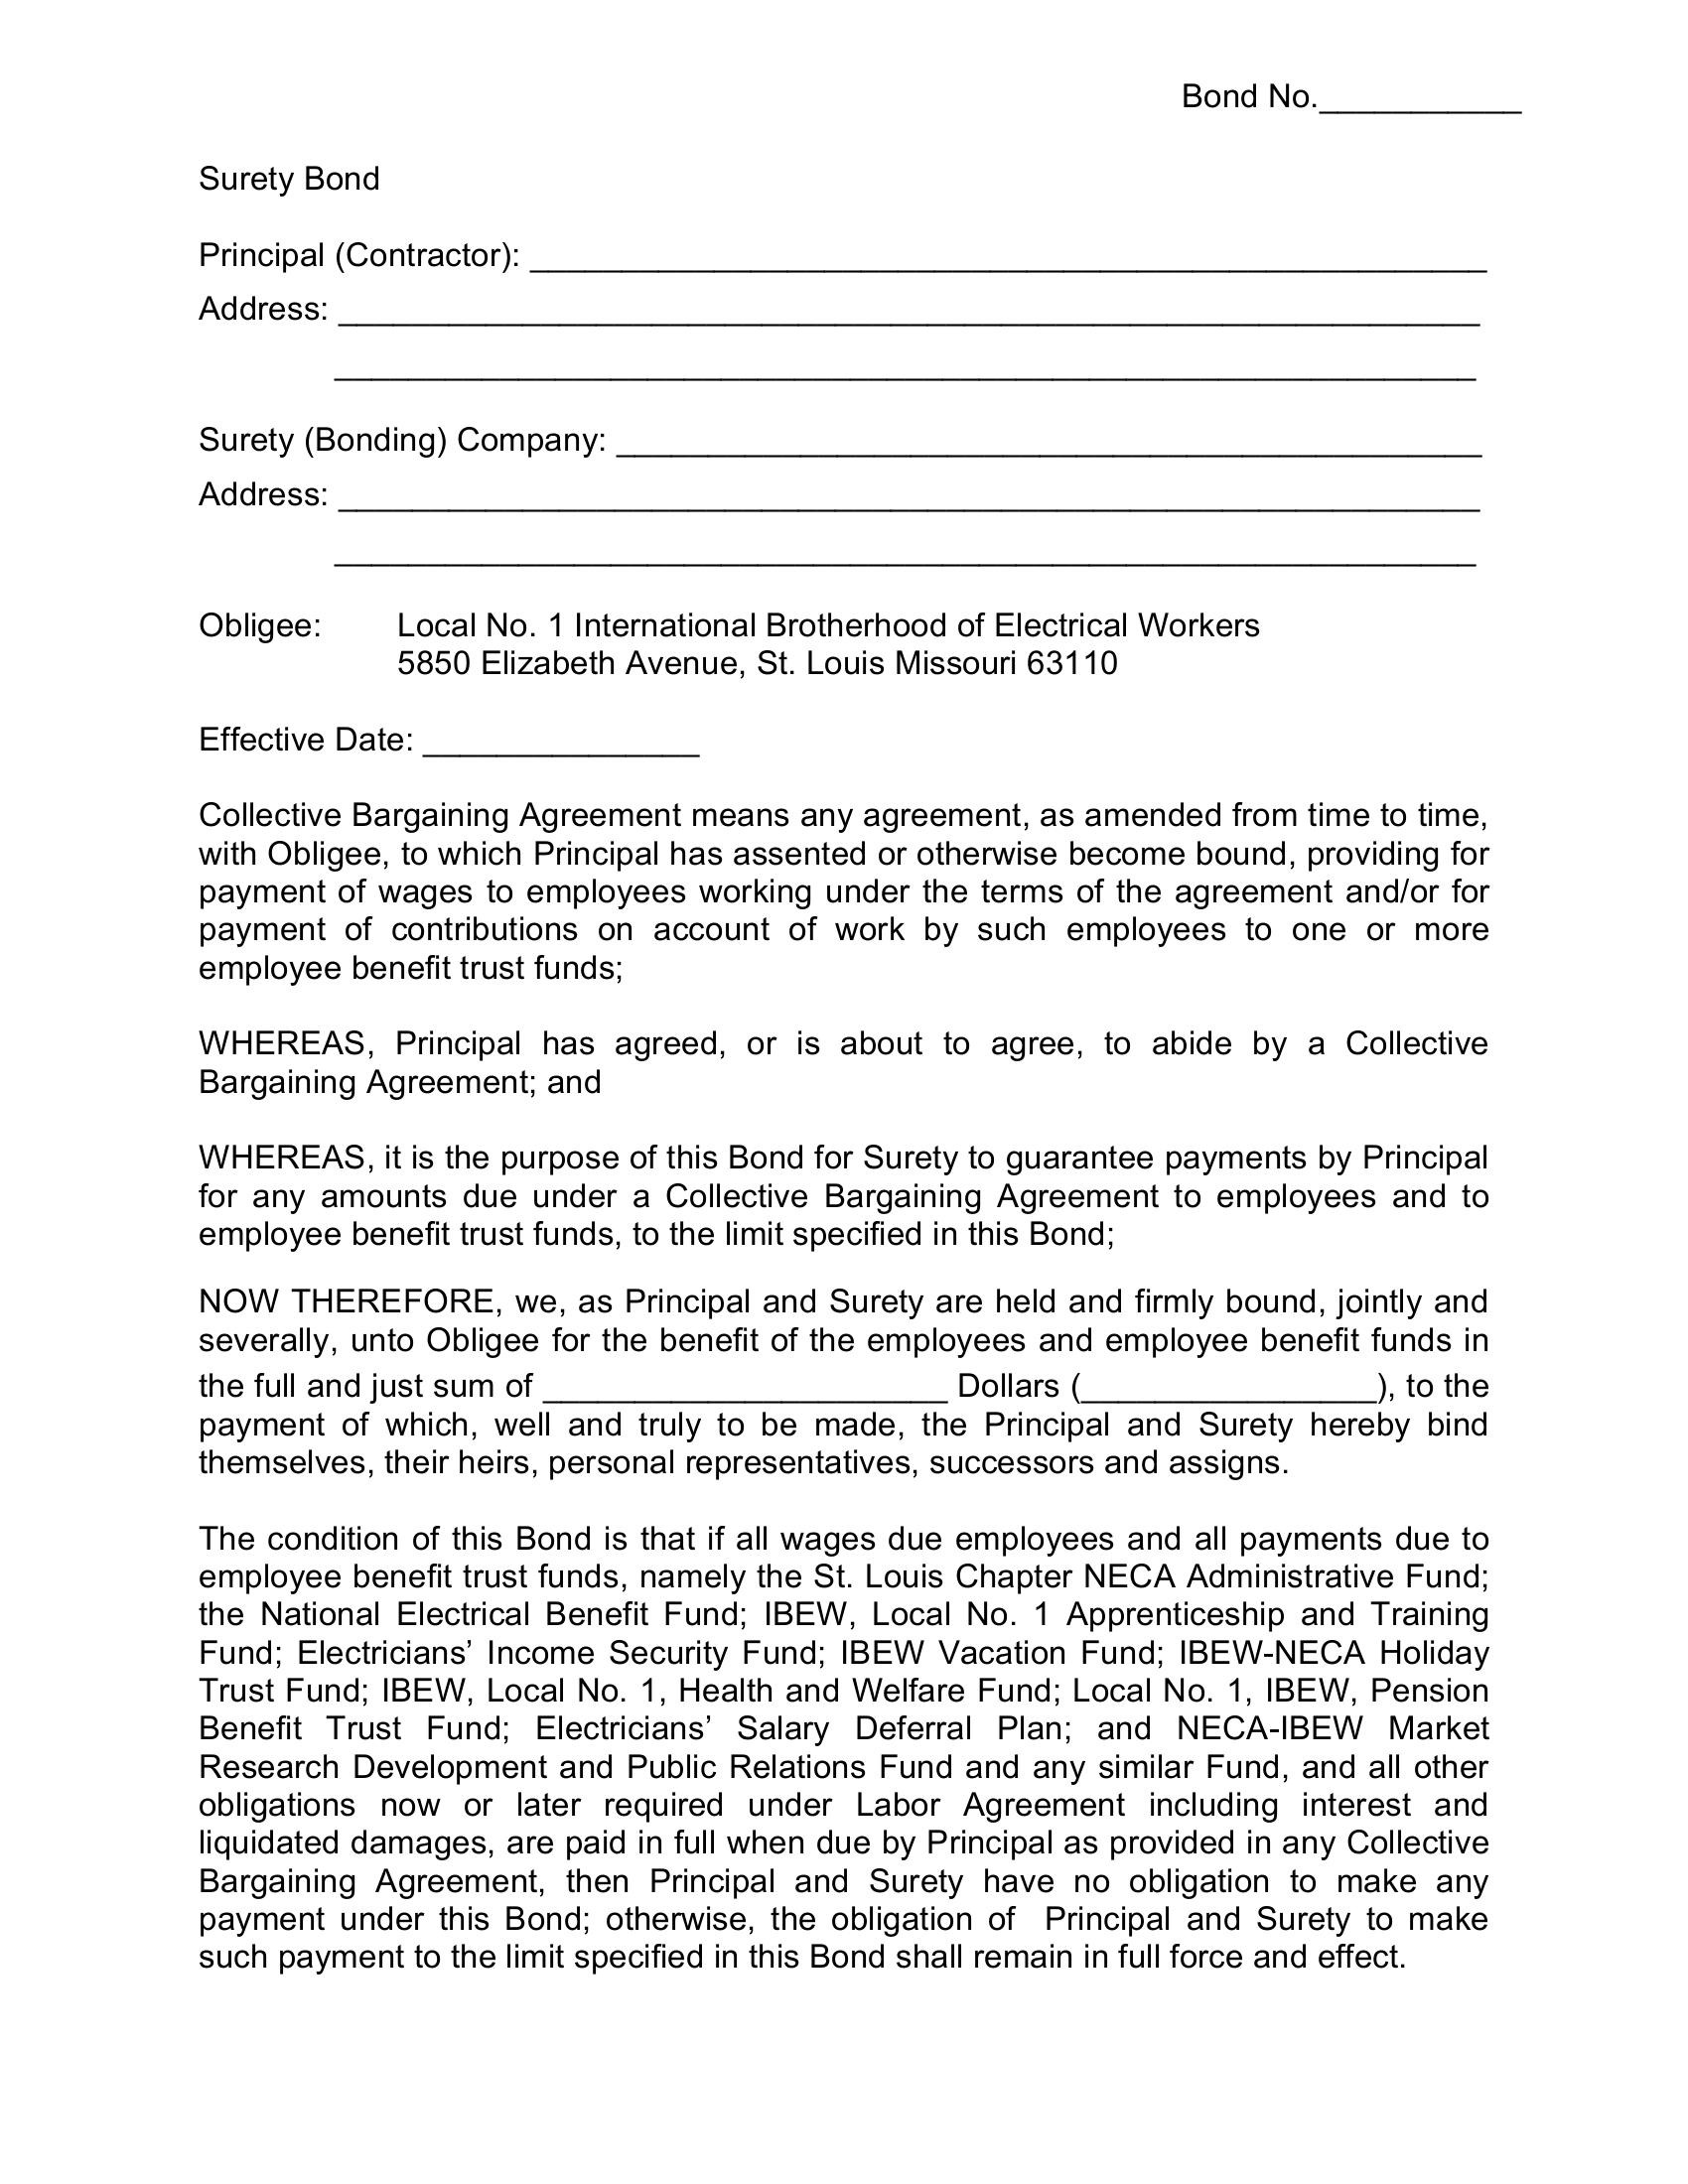 Union Wage and Welfare IBEW Local No. 1 Bond sample image